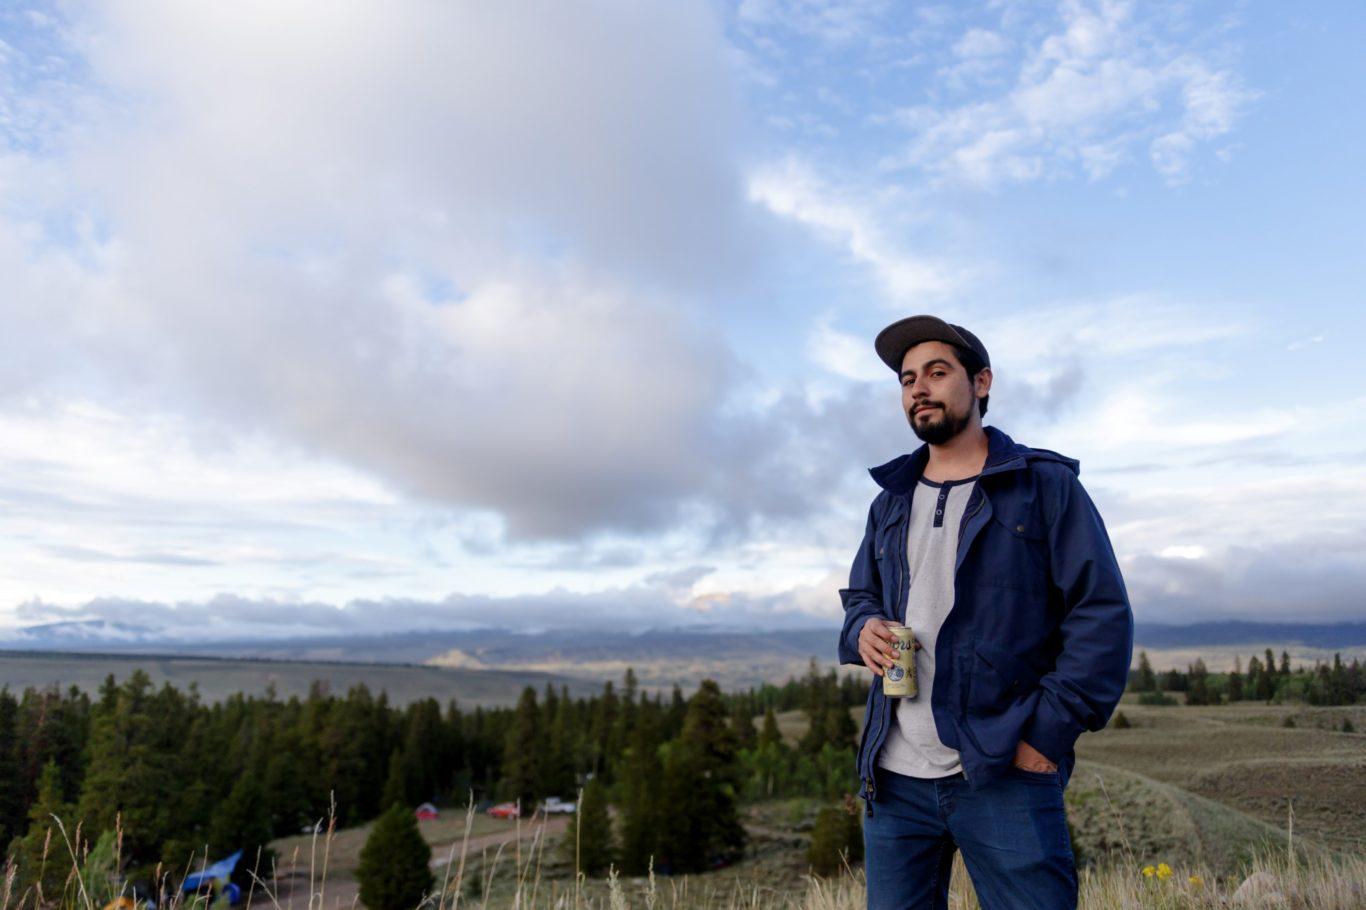 08-Colorado-Road-Trip-2016-Jeremy-Gallegos-Twin-Lakes-Reservoir-Kuhn